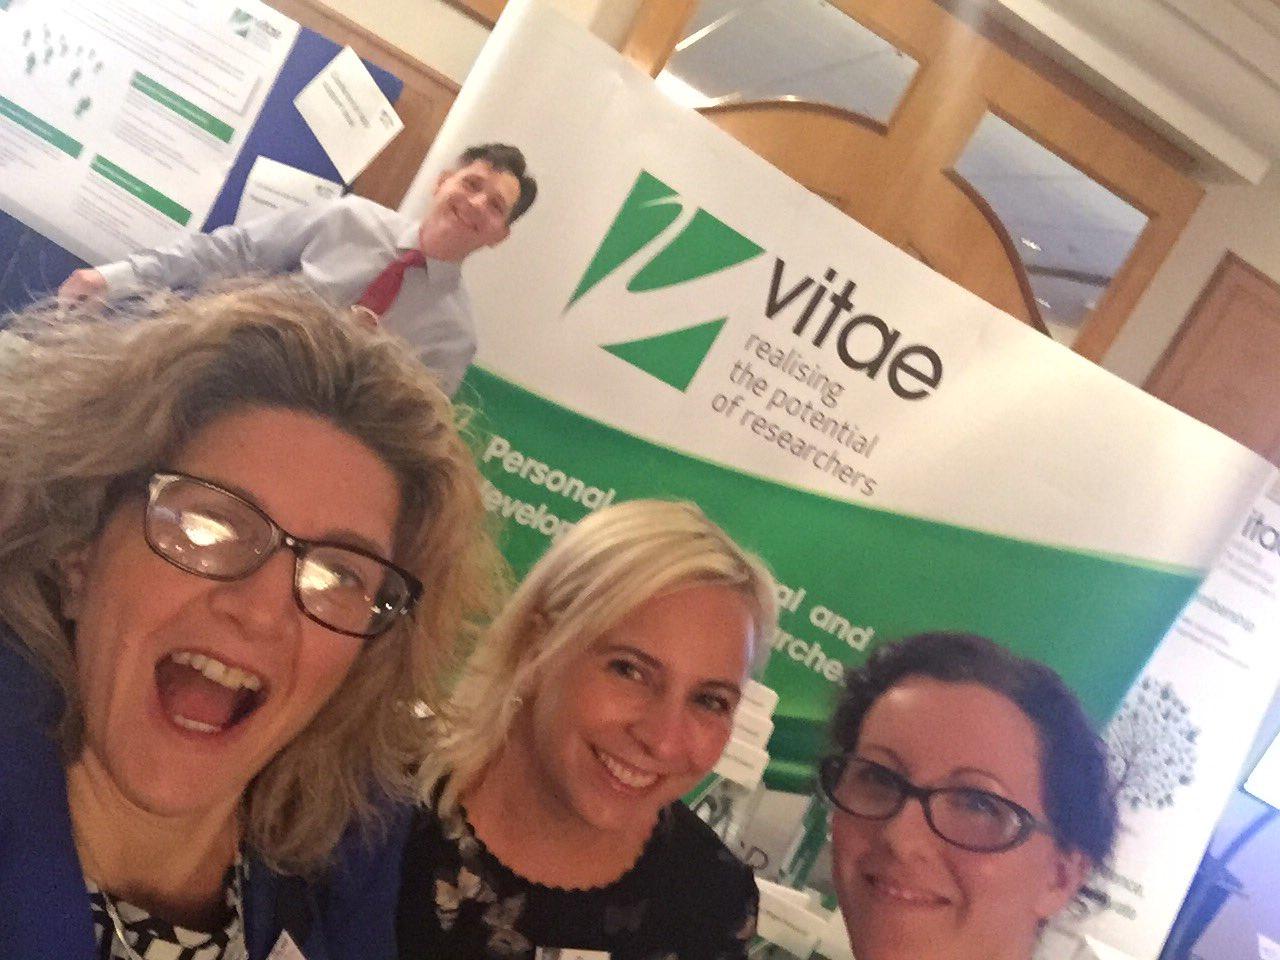 Thumbnail for Vitae Researcher Development International Conference 2017 #vitae17